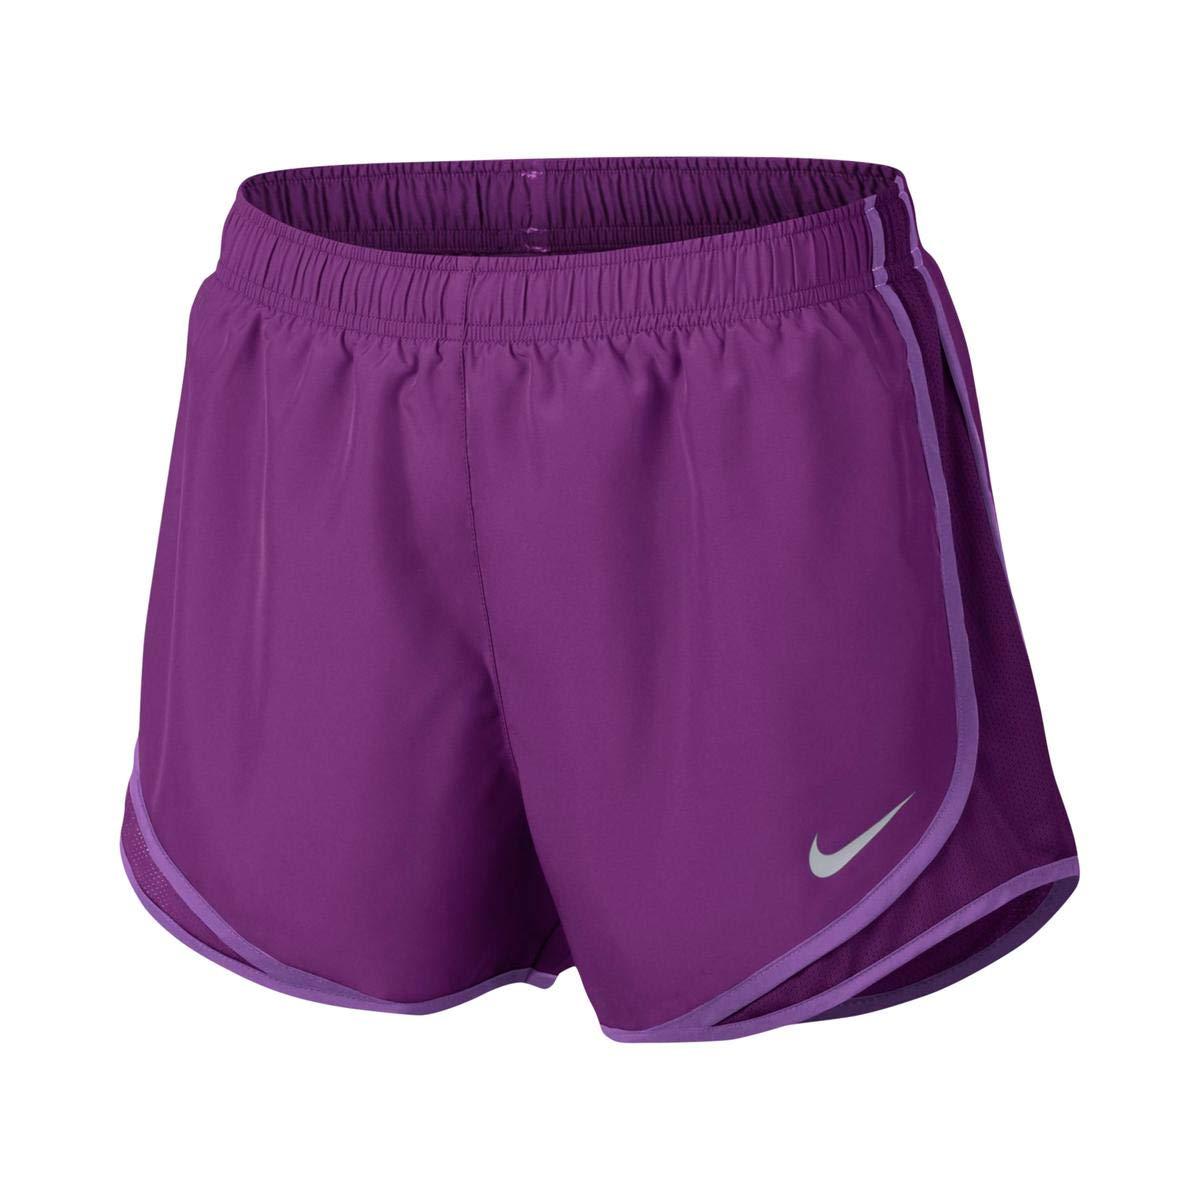 NIKE Womens Tempo Fitness Colorblock Shorts Purple L